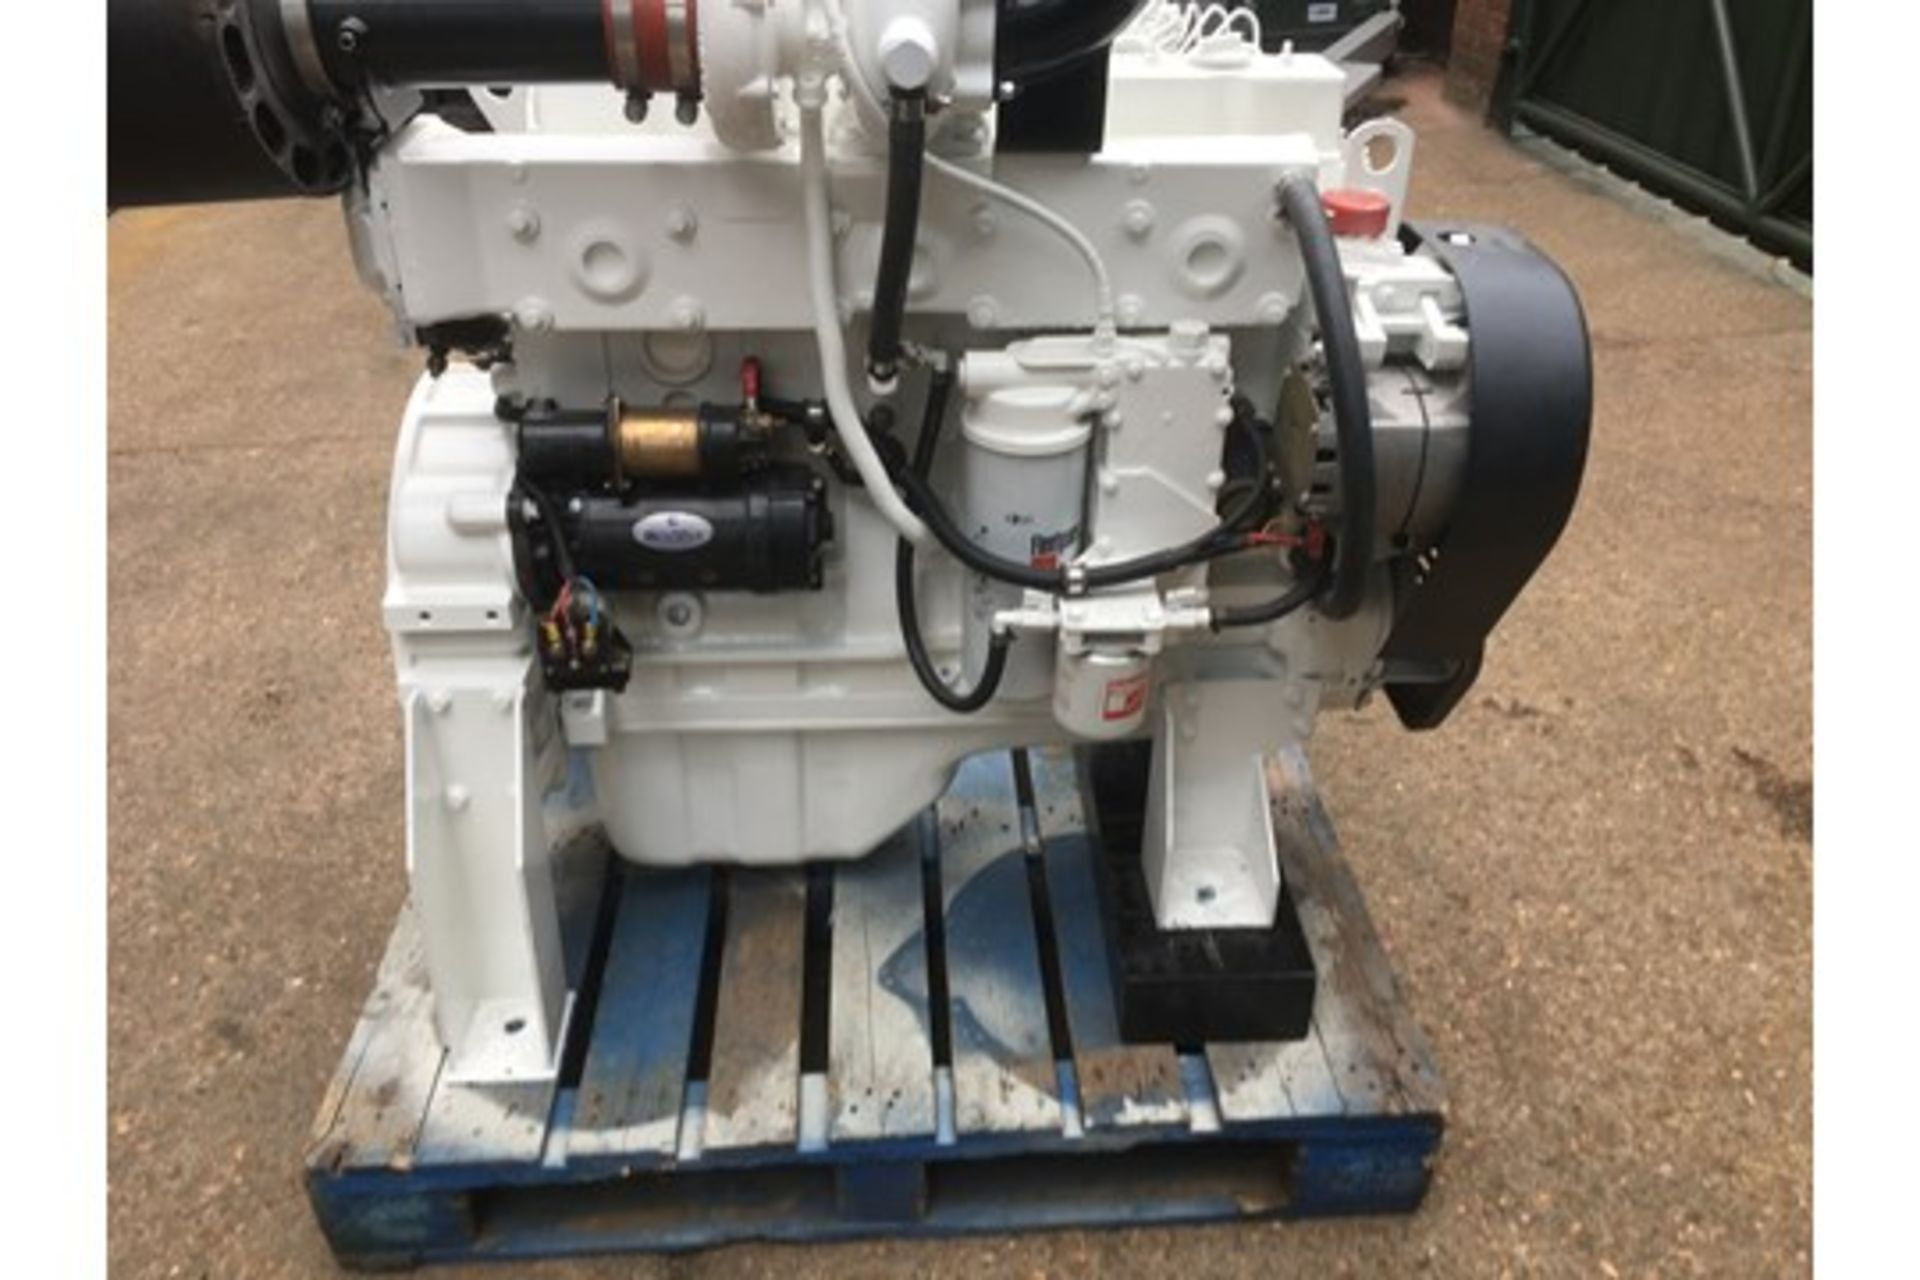 Lot 42 - A Cummins Model 6CT 8.3 6 Cylinder Marine Diesel Engine.